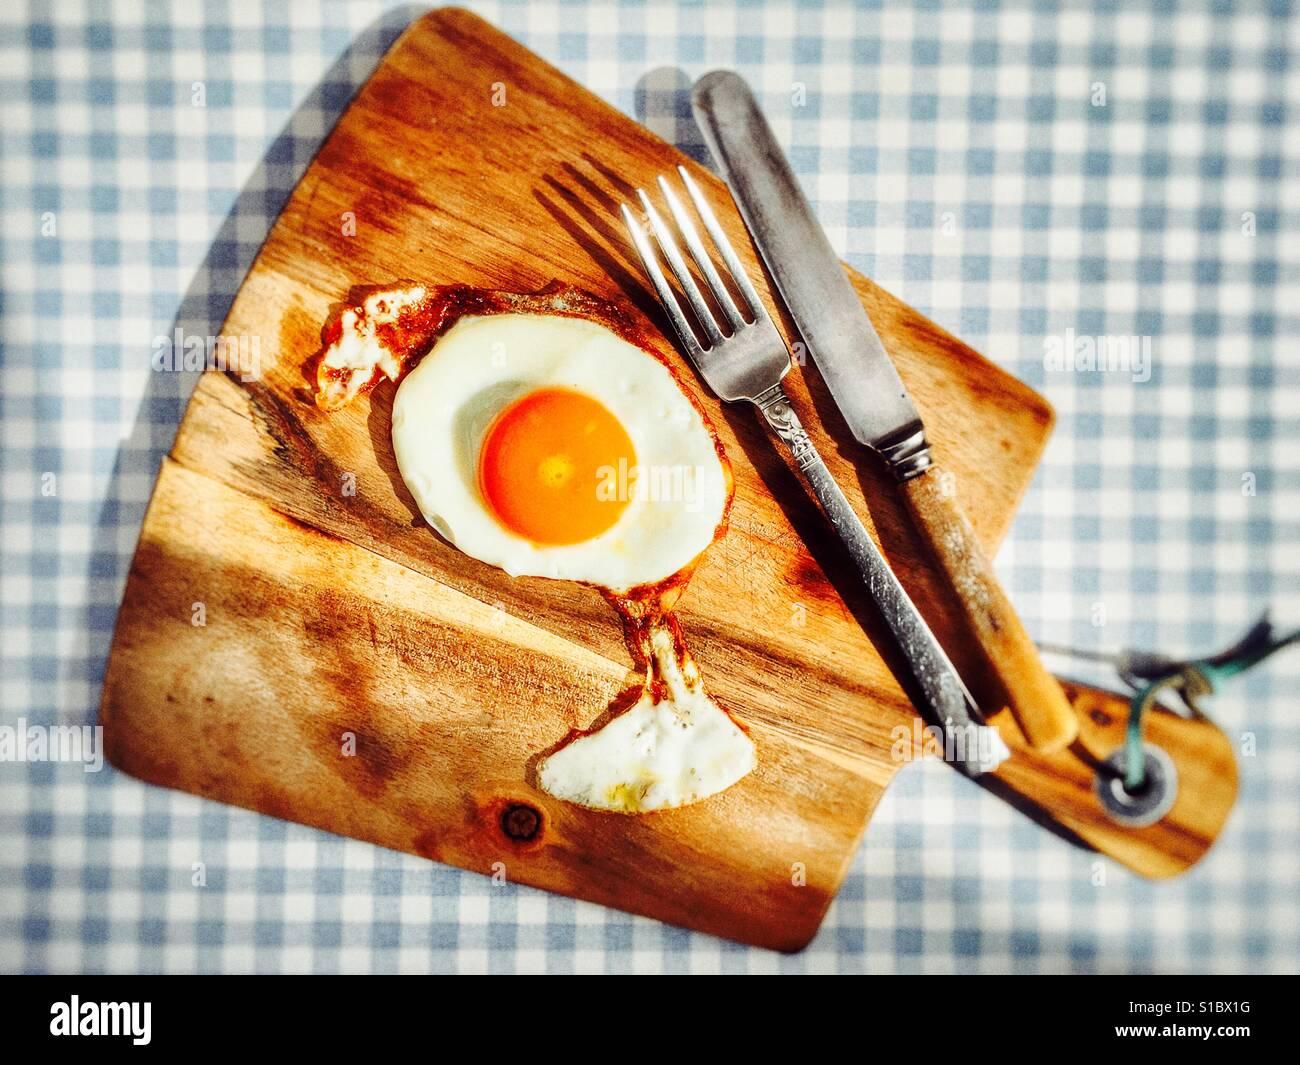 Fried egg on wooden serving board - Stock Image